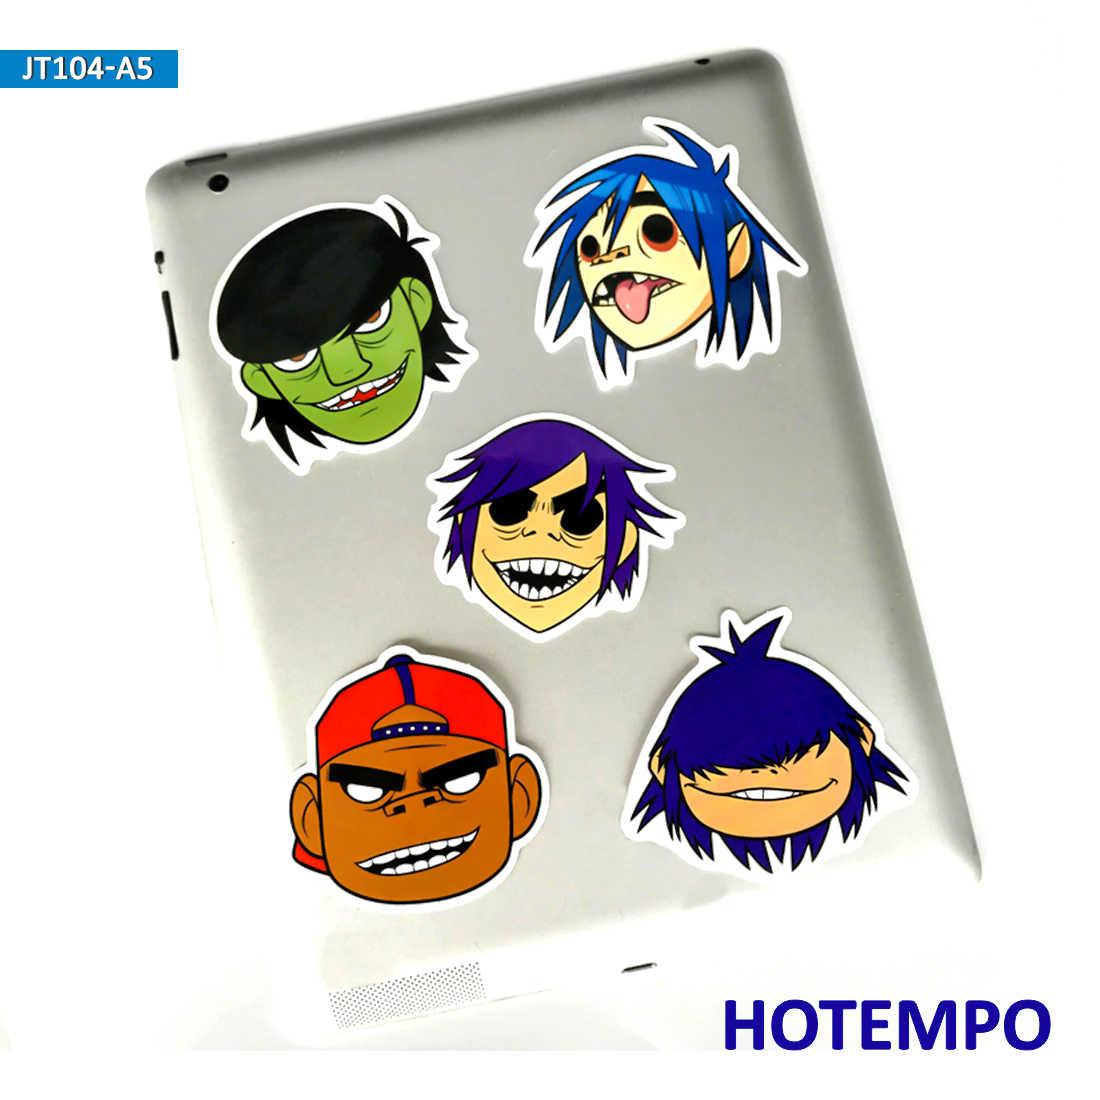 5pcs Hip Hop Blur Music Band Gorillaz Rap Cool Stickers for Mobile Phone Laptop Luggage Guitar Case Skateboard Bike Car Stickers